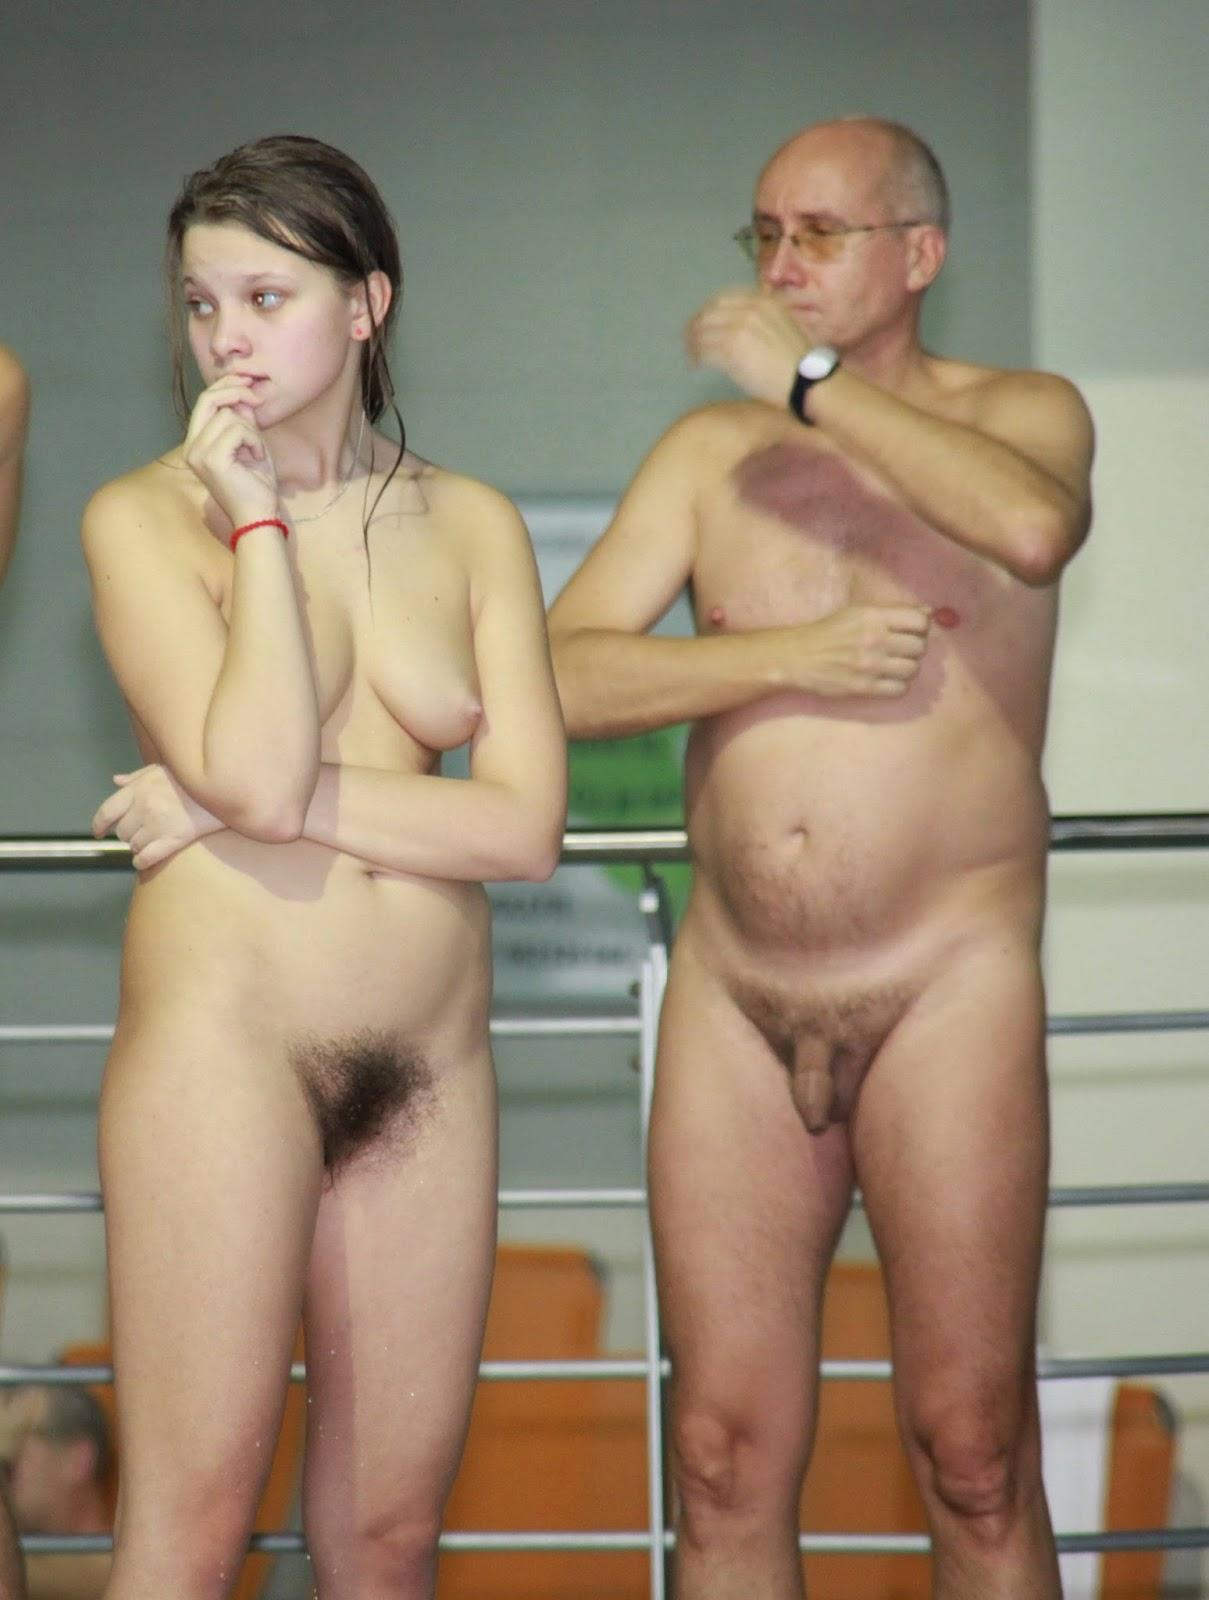 Nudist resort british columbia seemed